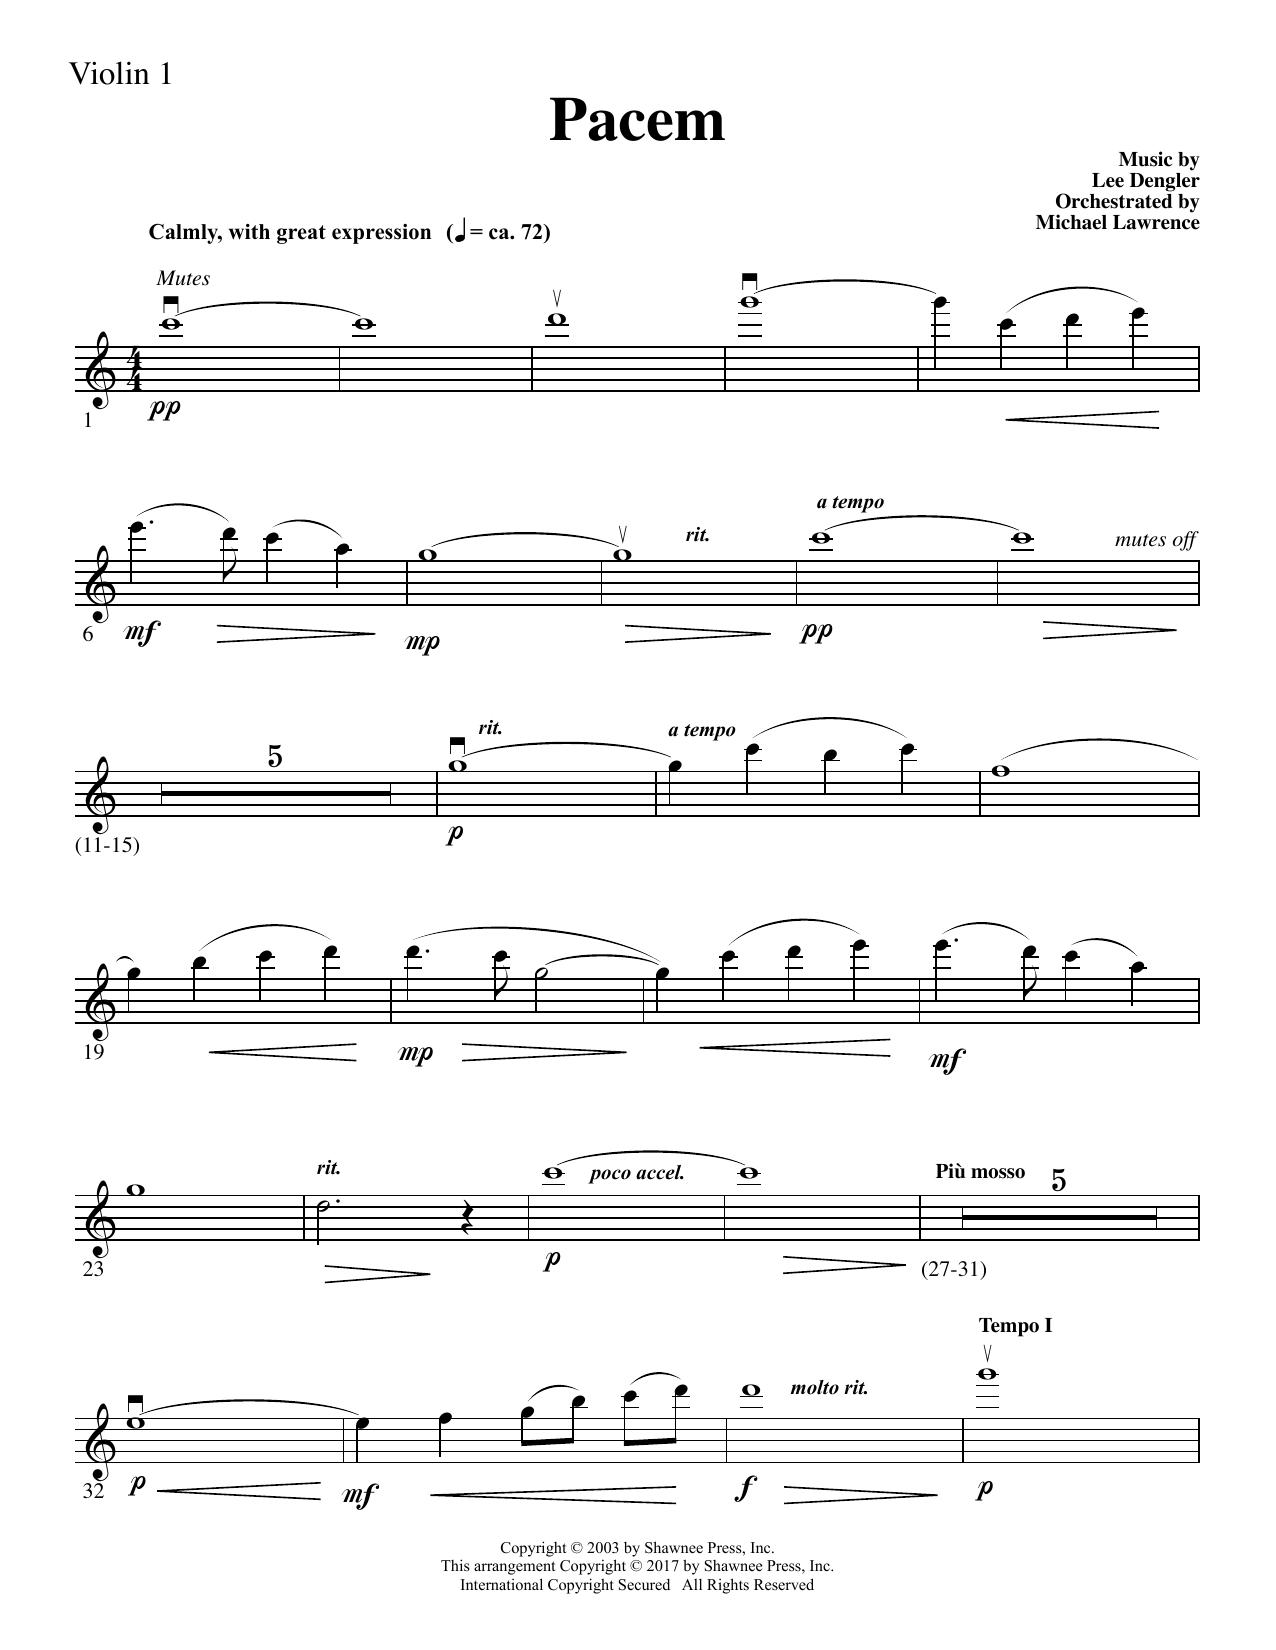 Pacem - Violin 1